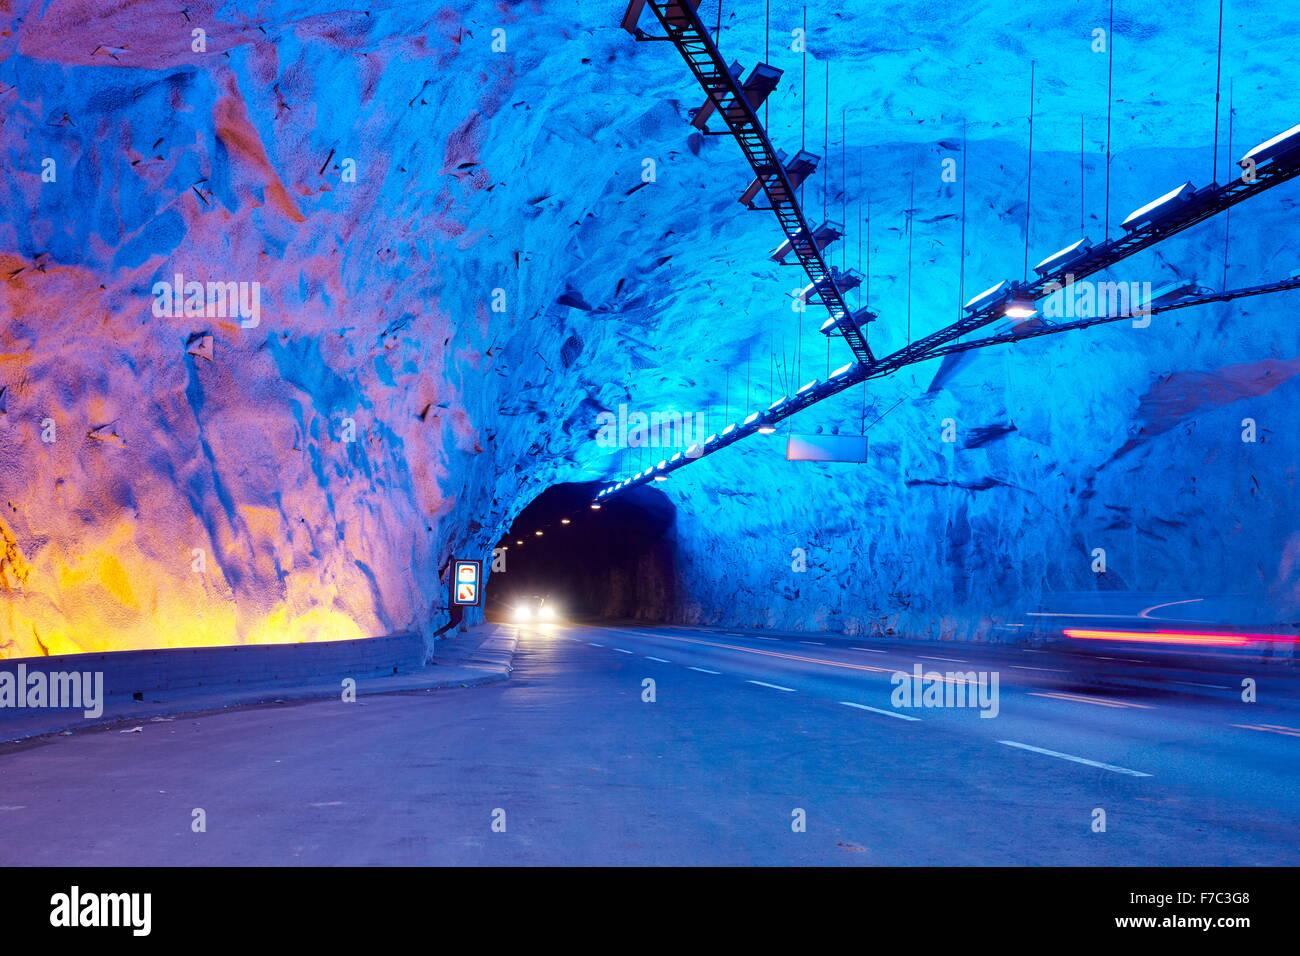 Laerdal Tunnel between Aurland and Laerdal, Laerdalstunnelen (the world's longest at 24,5 km) Aurland, Norway - Stock Image